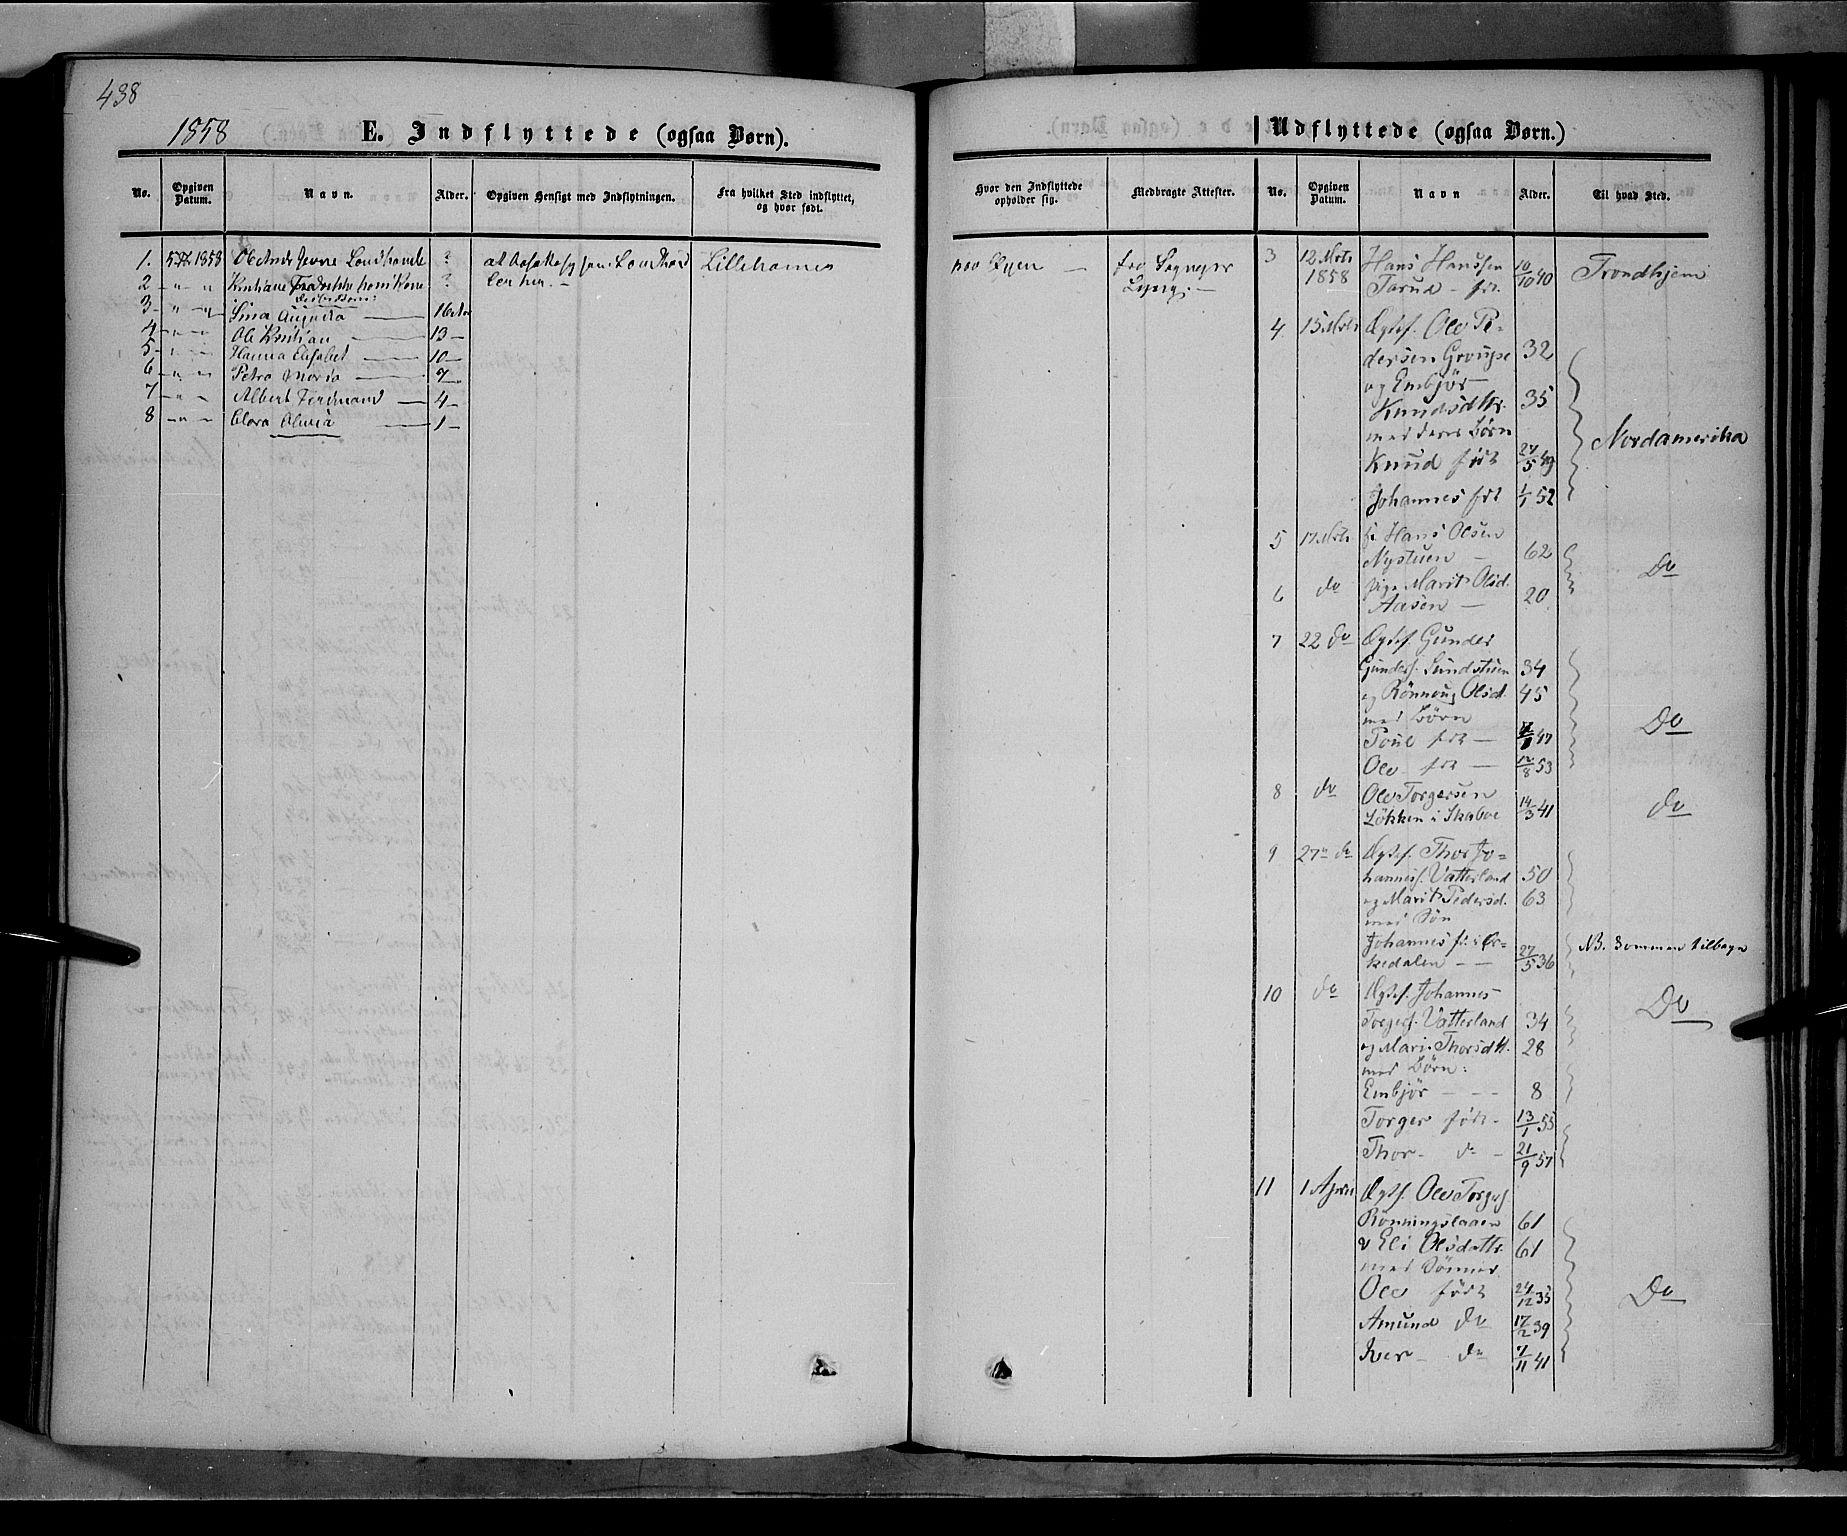 SAH, Nord-Fron prestekontor, Ministerialbok nr. 1, 1851-1864, s. 438